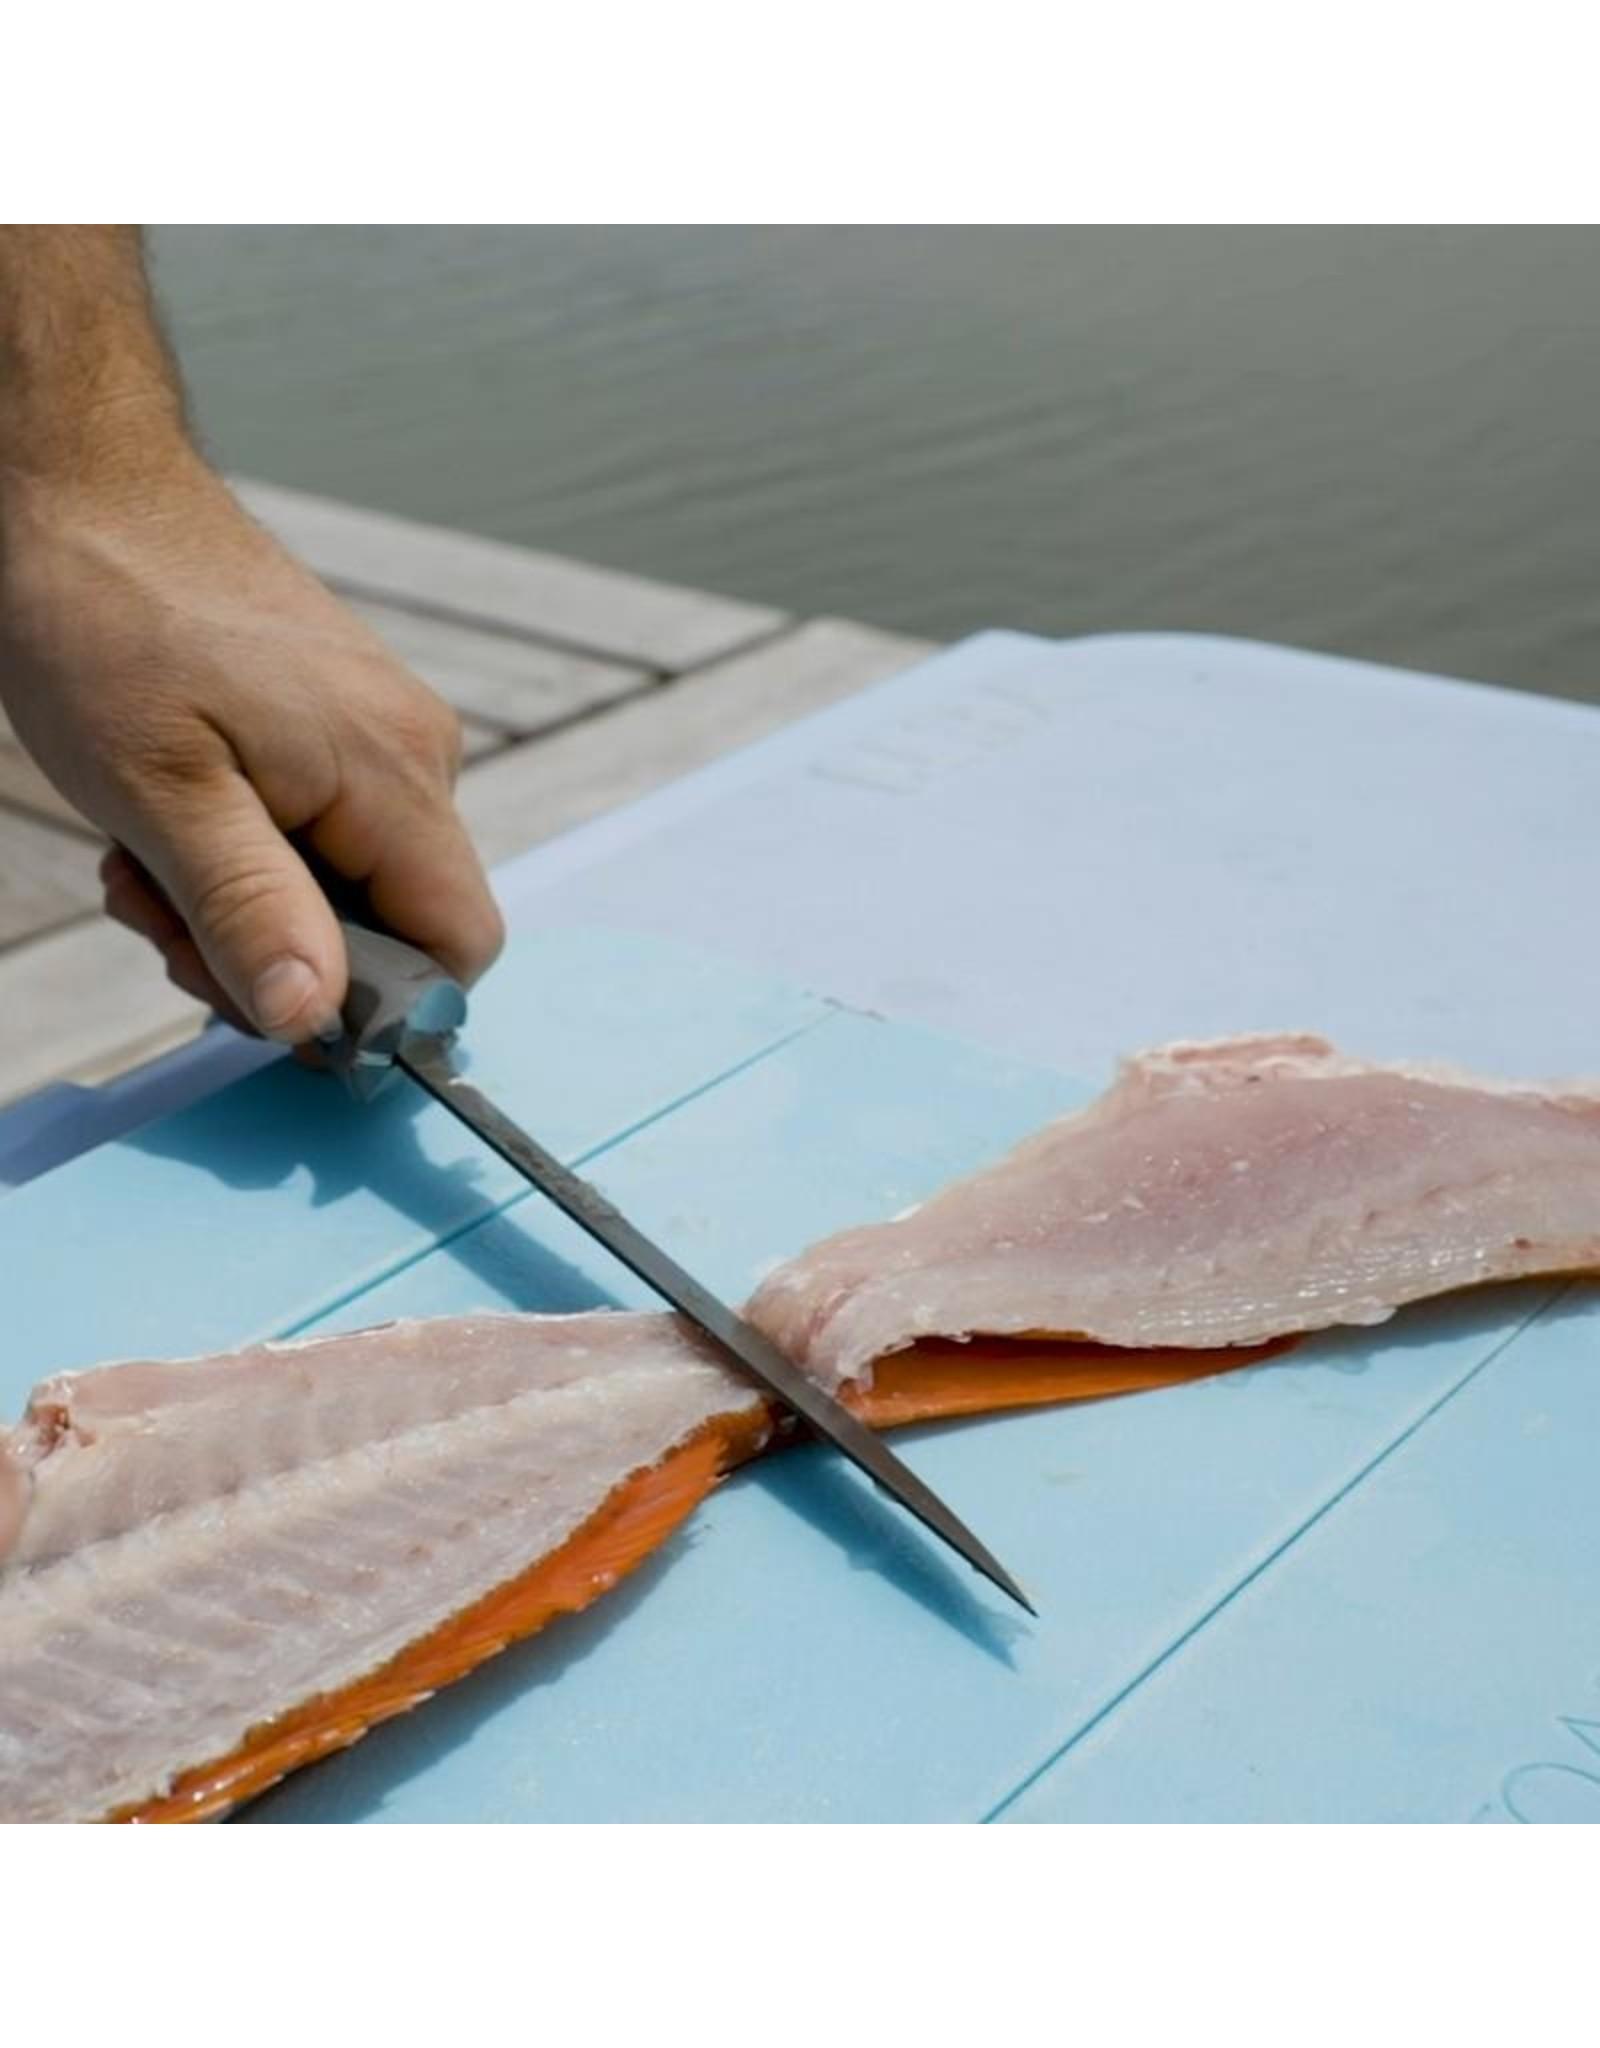 Toadfish Folding Filet Knife w/built in Carabiner